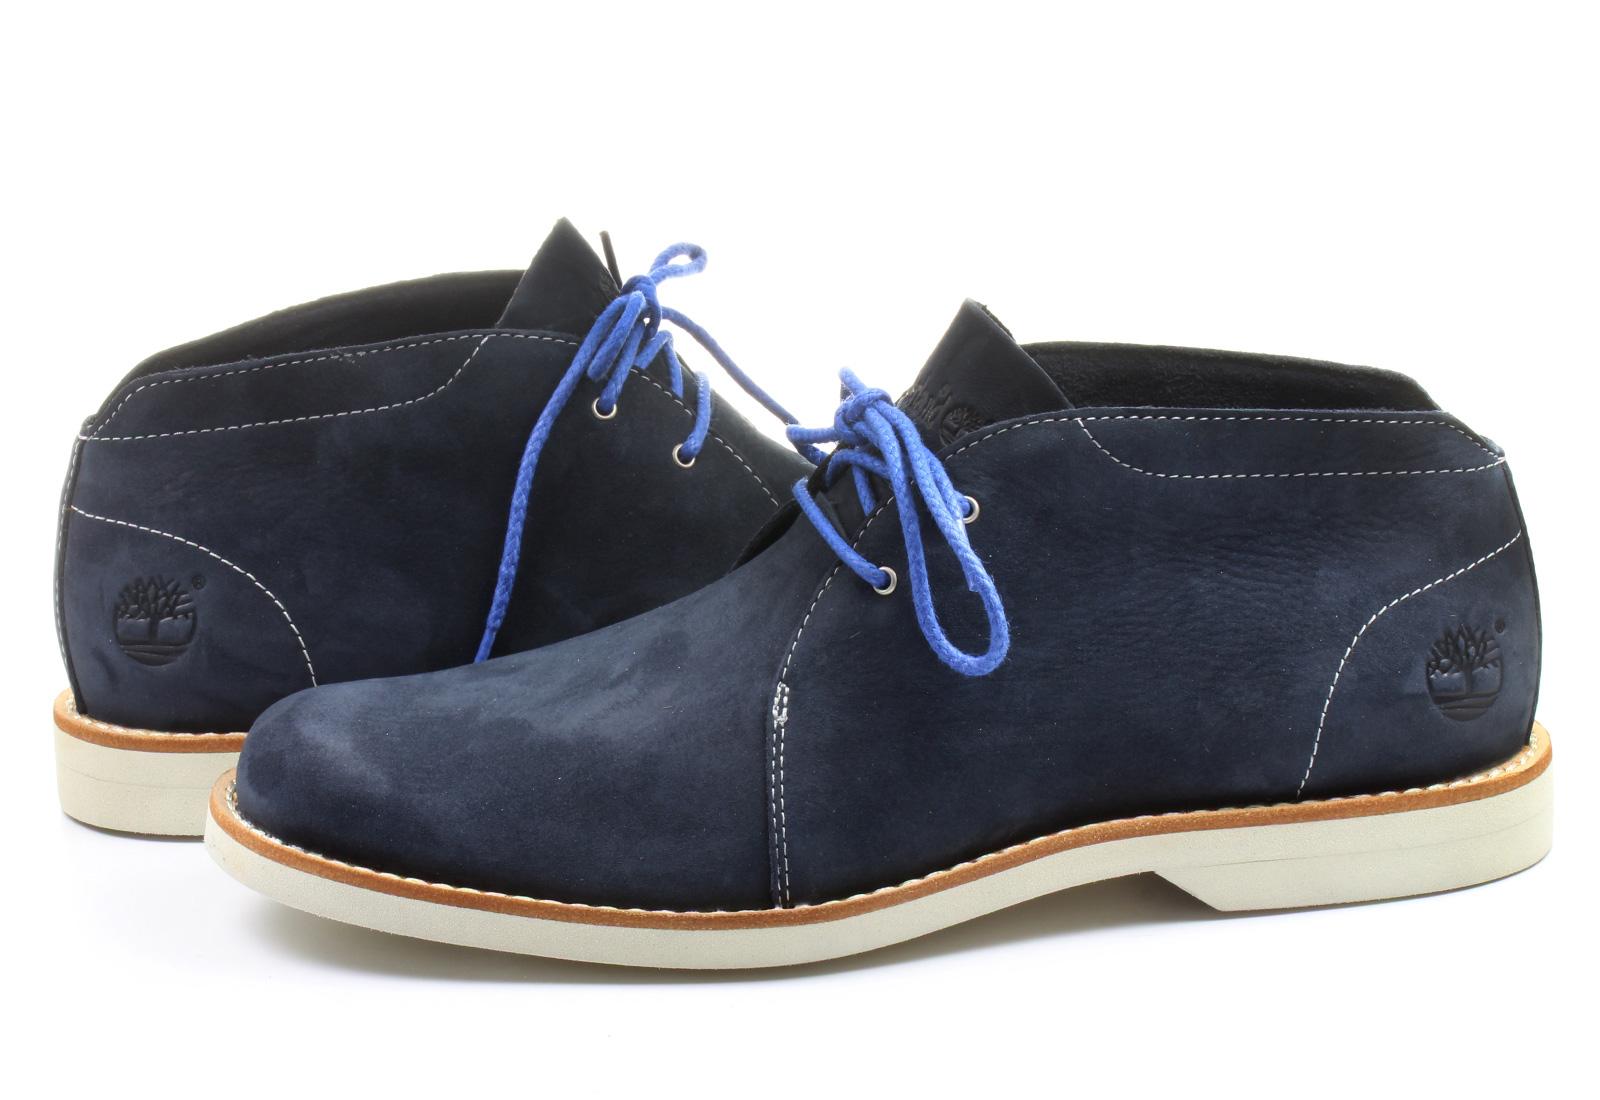 Timberland Shoes Stormbuck Chukka